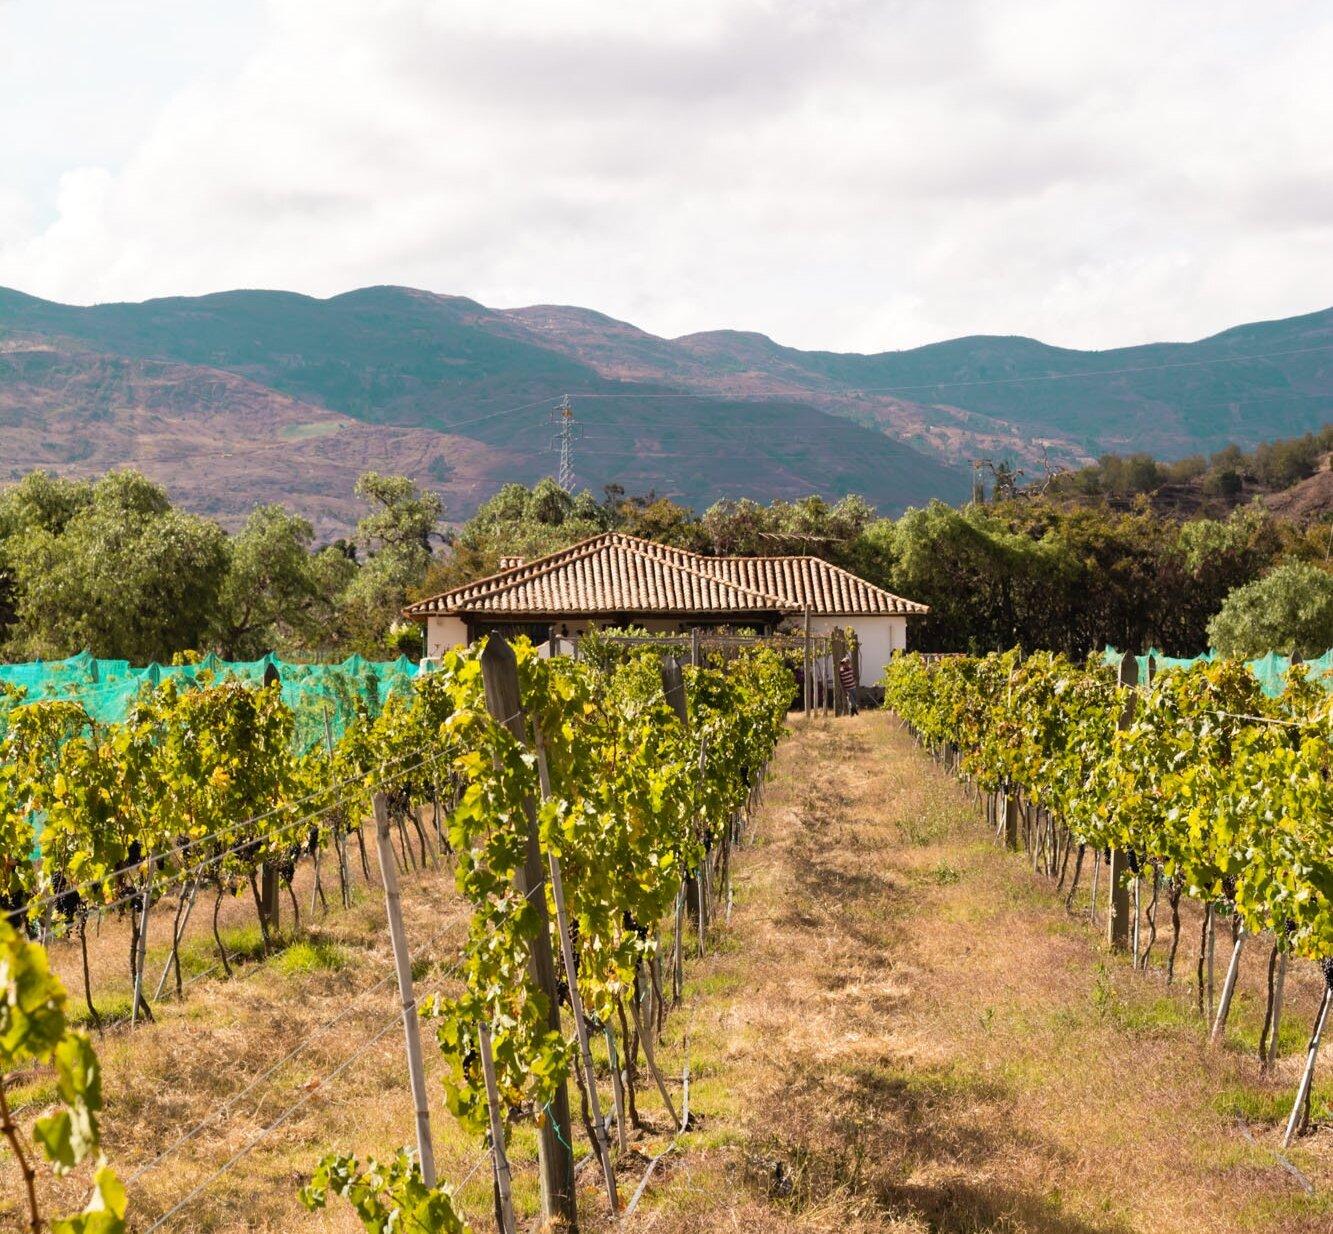 Viñedo Umaña Dajud - Villa de Leyva